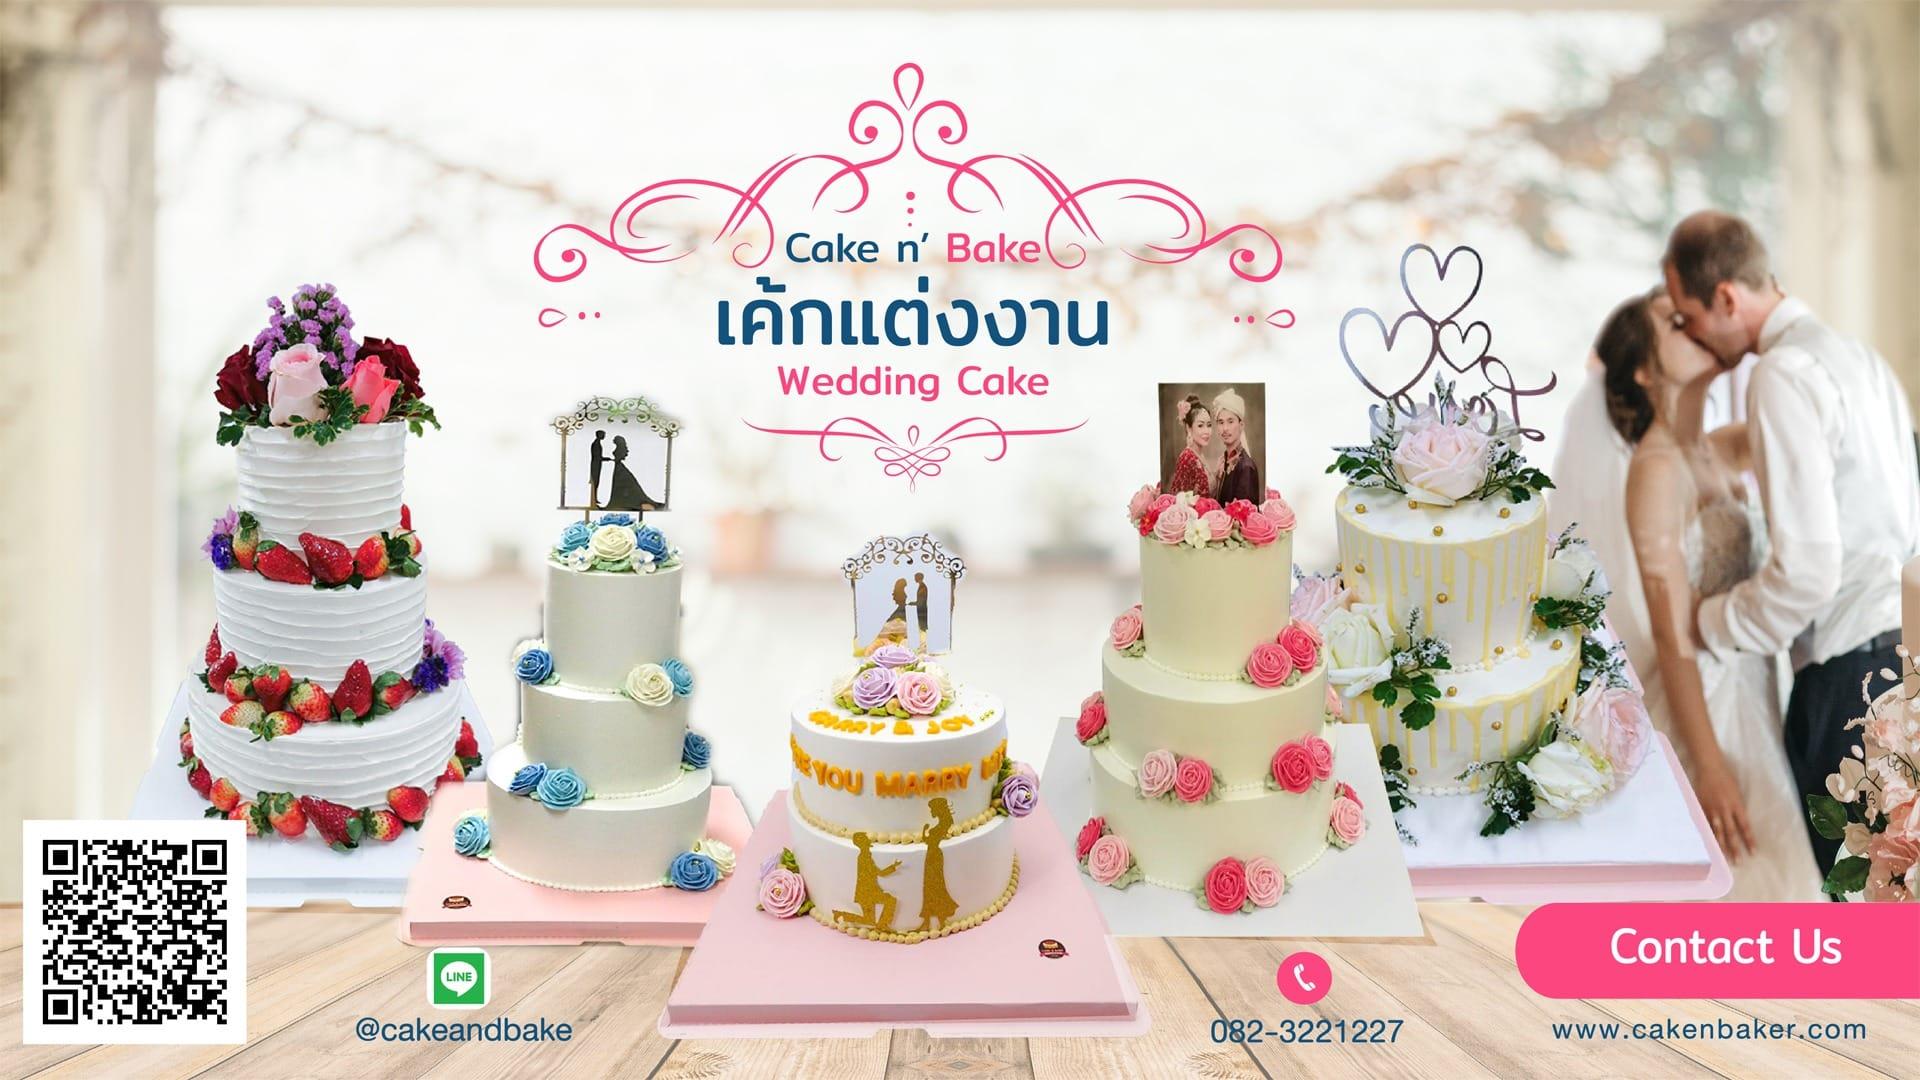 wedding cake banner 17062020